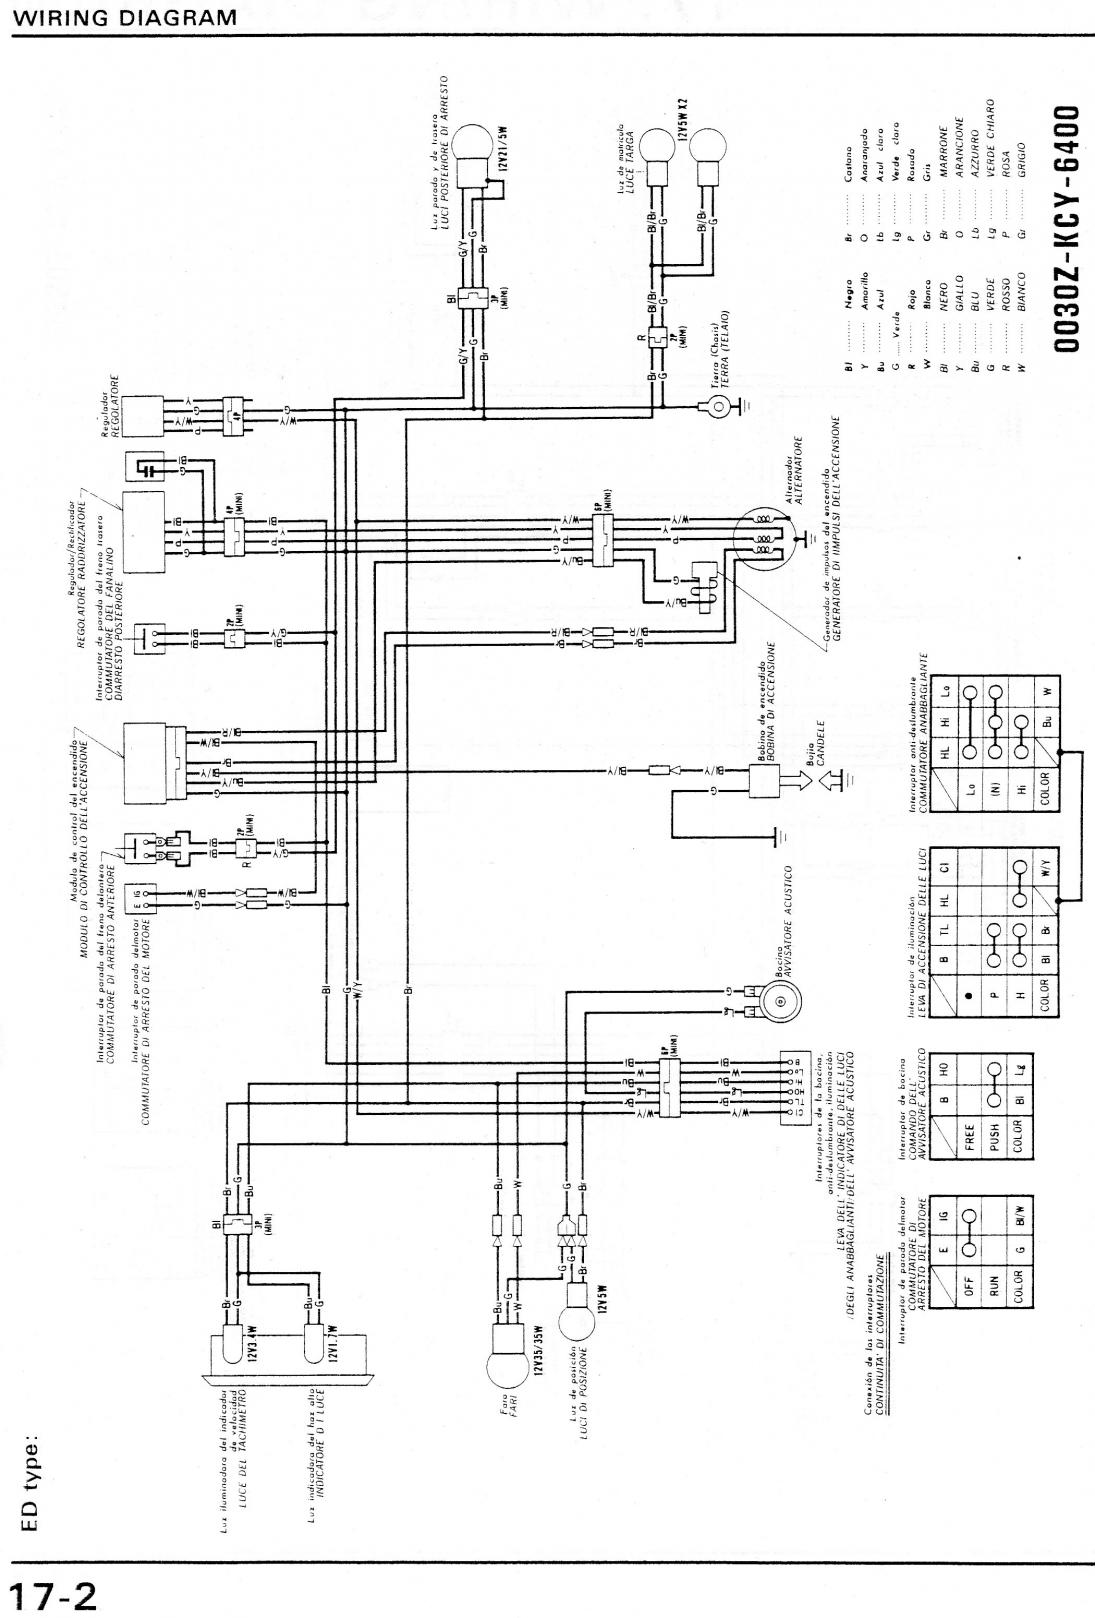 hight resolution of mitsubishi l200 alternator wiring diagram 41 wiring farmtrac tractor wiring diagram mitsubishi wiring diagrams tractor d2000ii